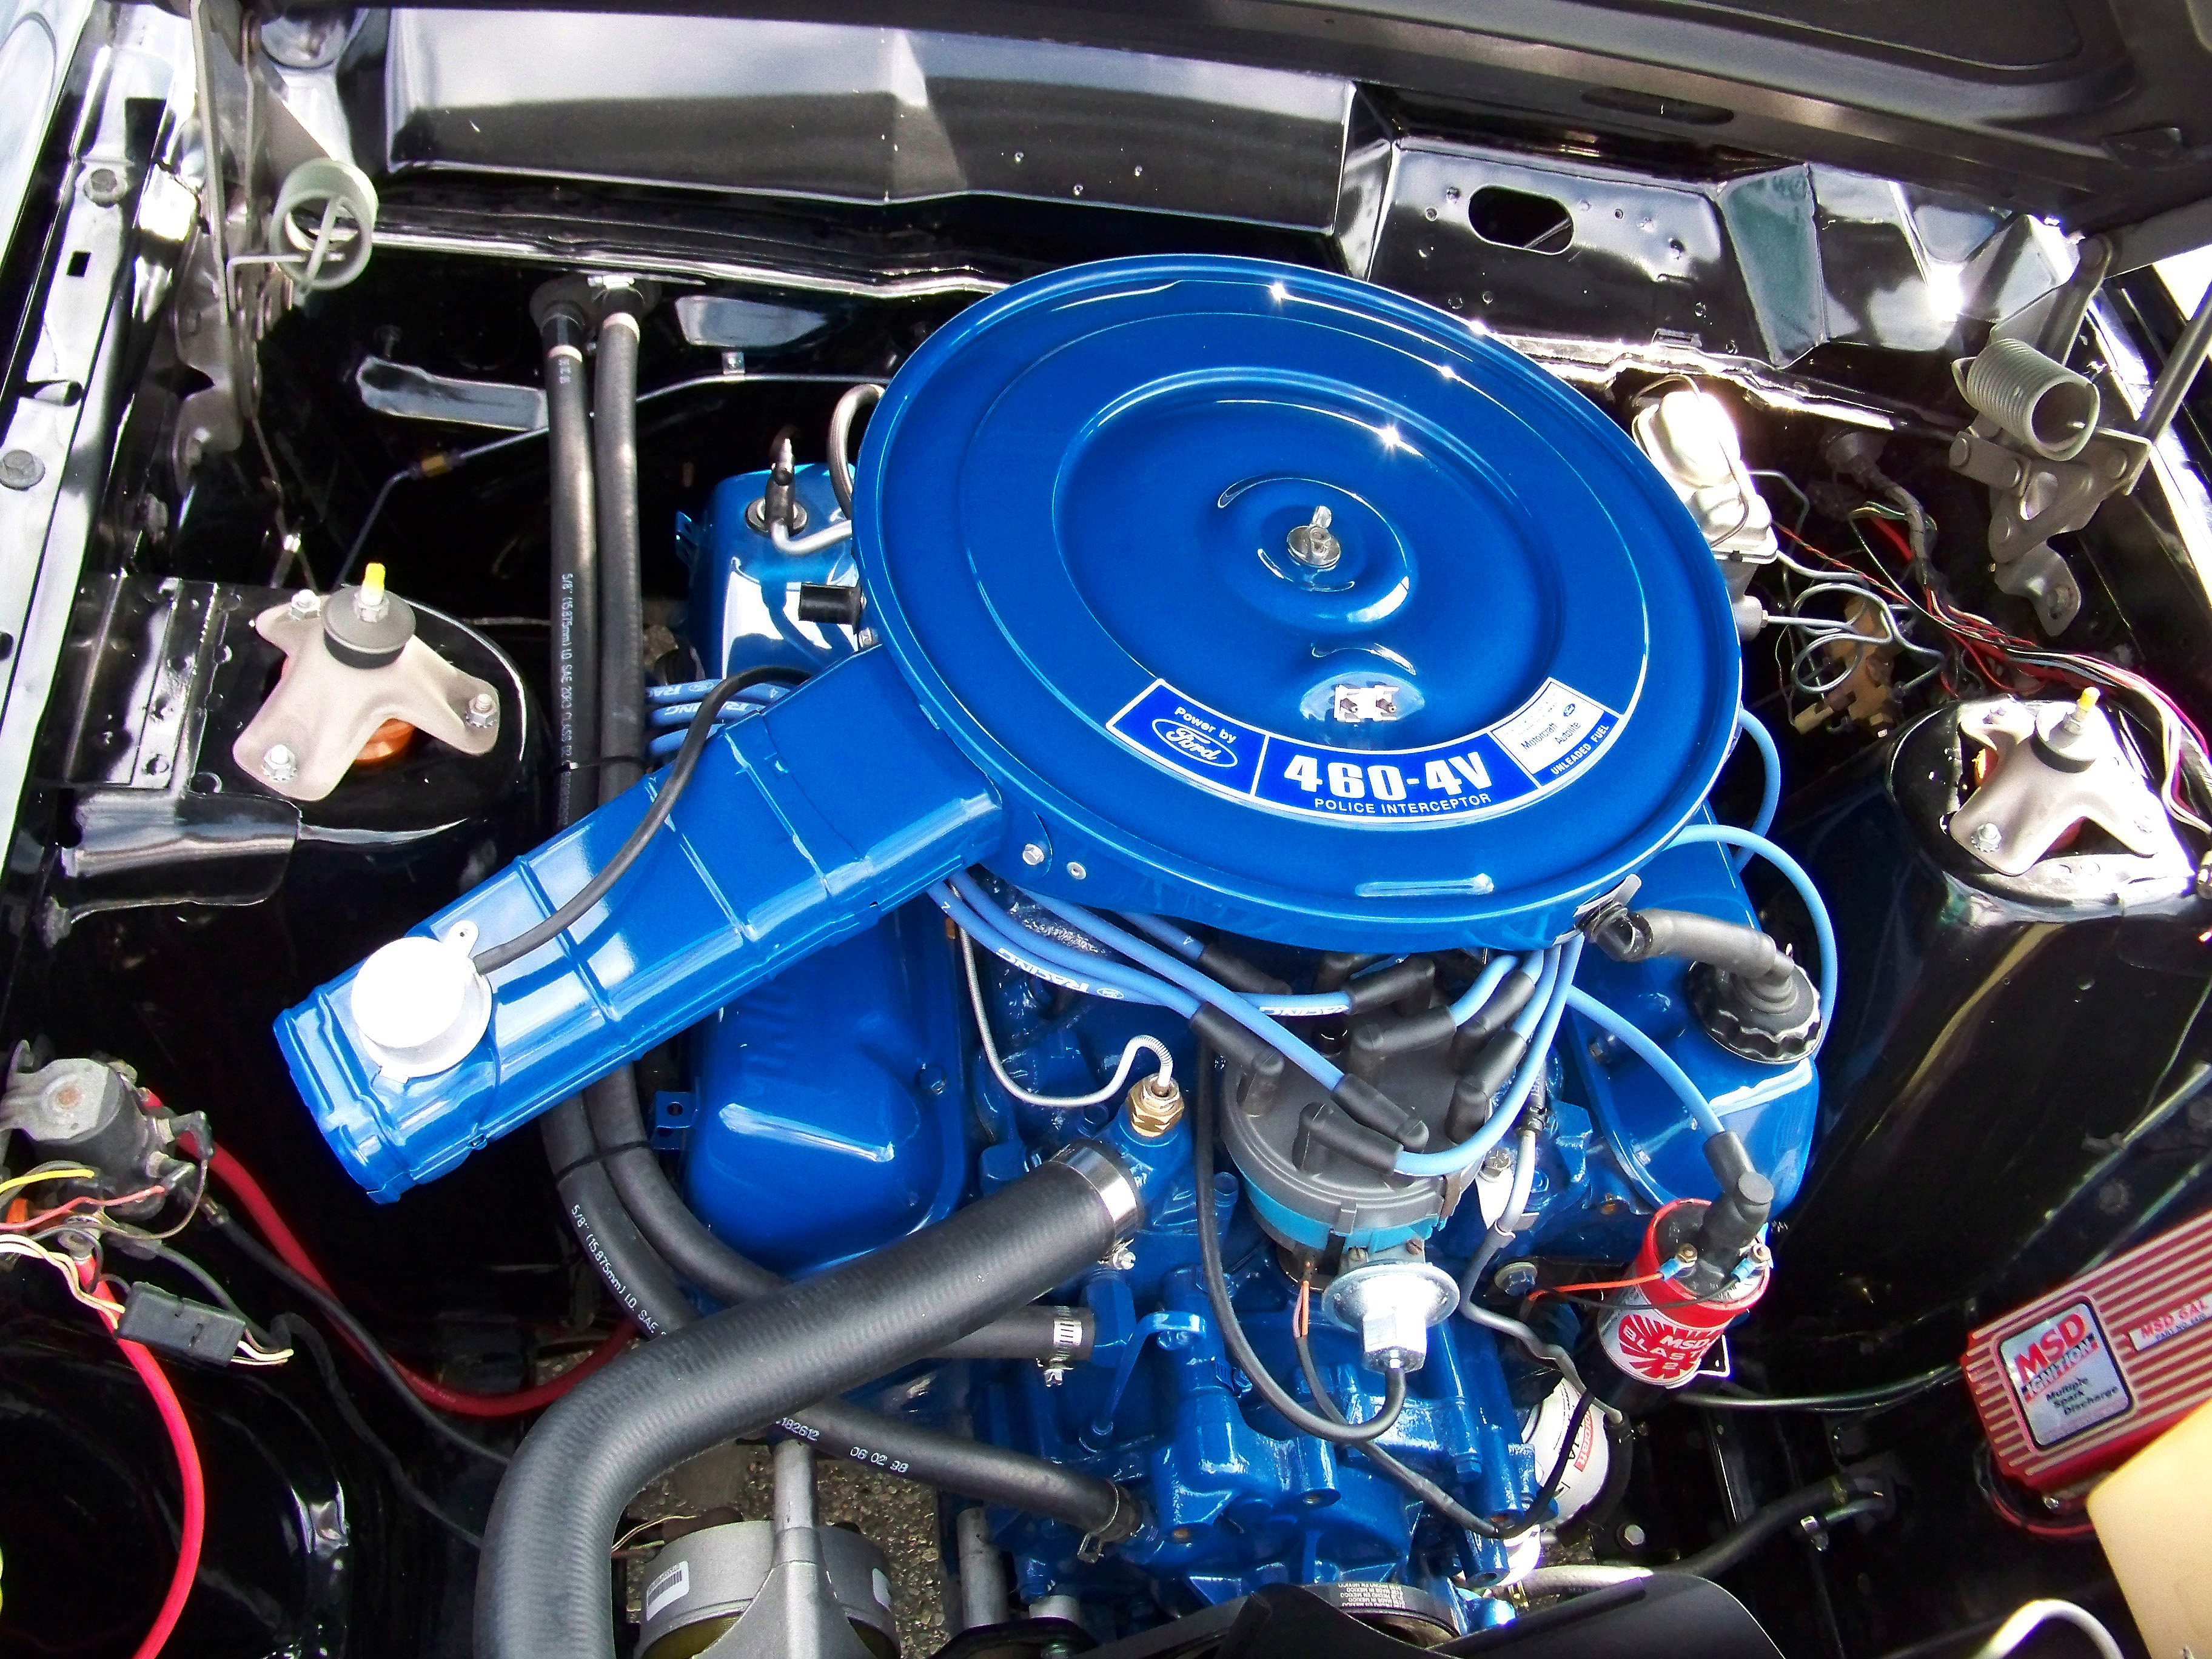 Ford 460 police interceptor